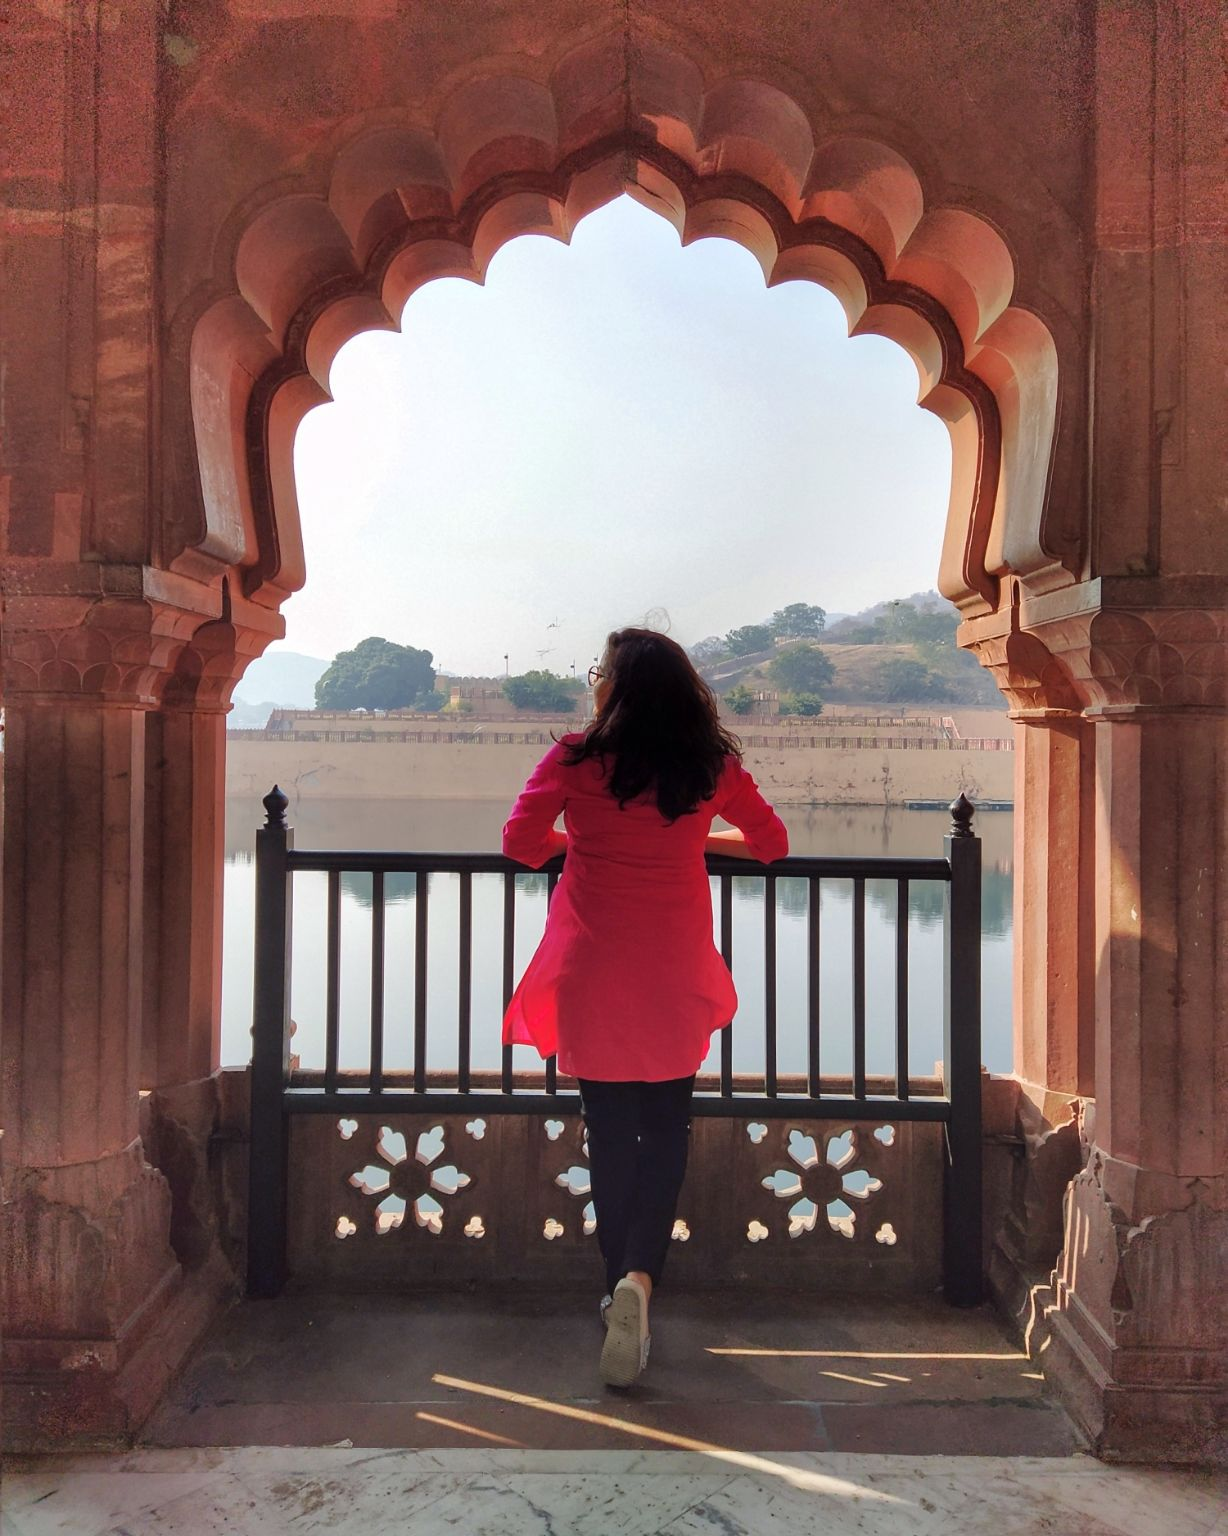 Photo of Amer Fort Jaipur By Priyanka Trigune